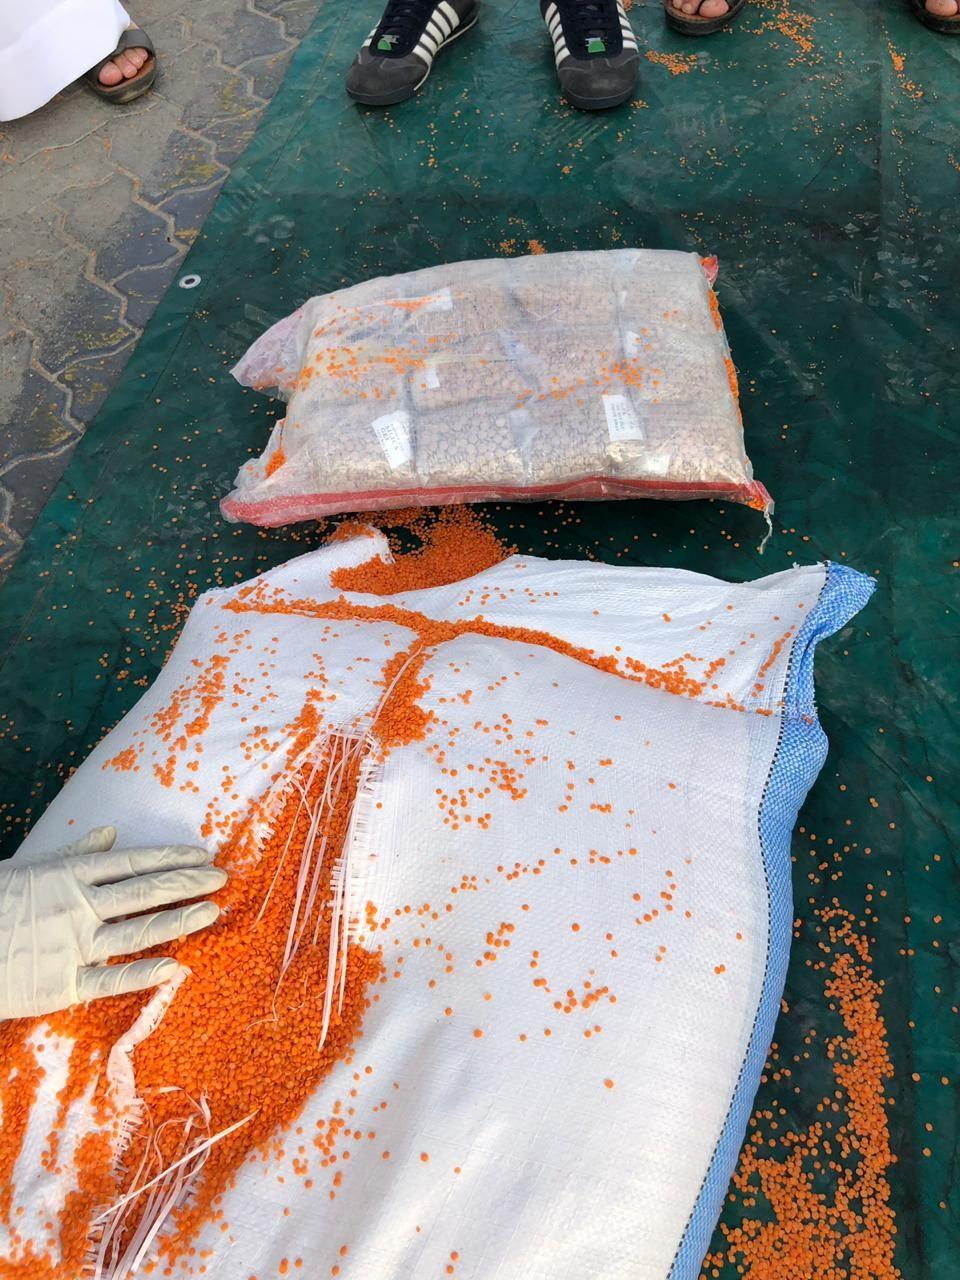 dubai customs seizes 5.7 million captagon pills  2